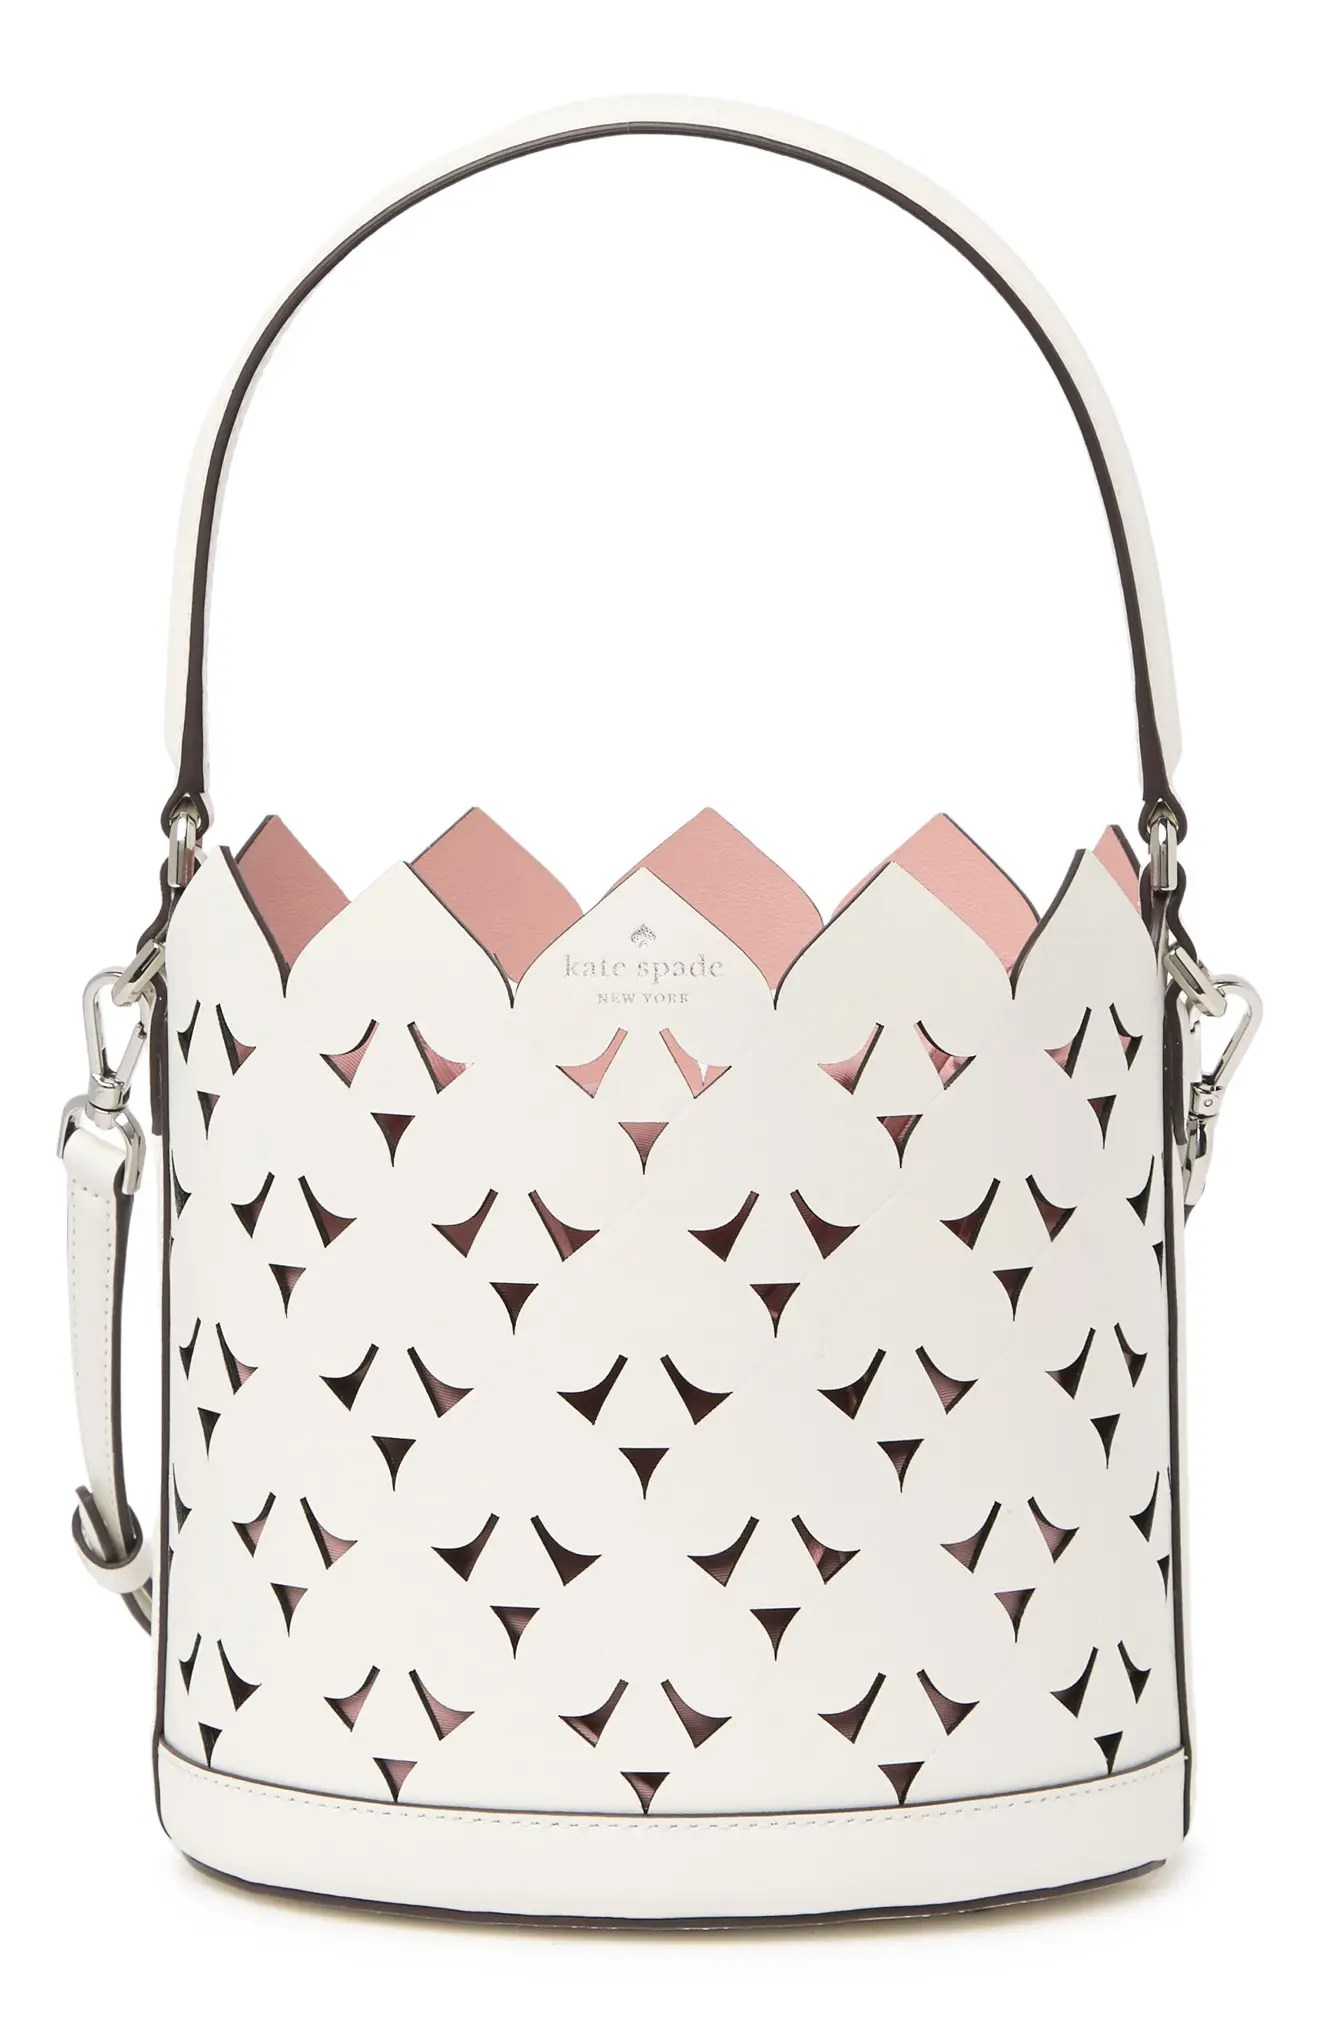 kate spade new york shoulder bags for